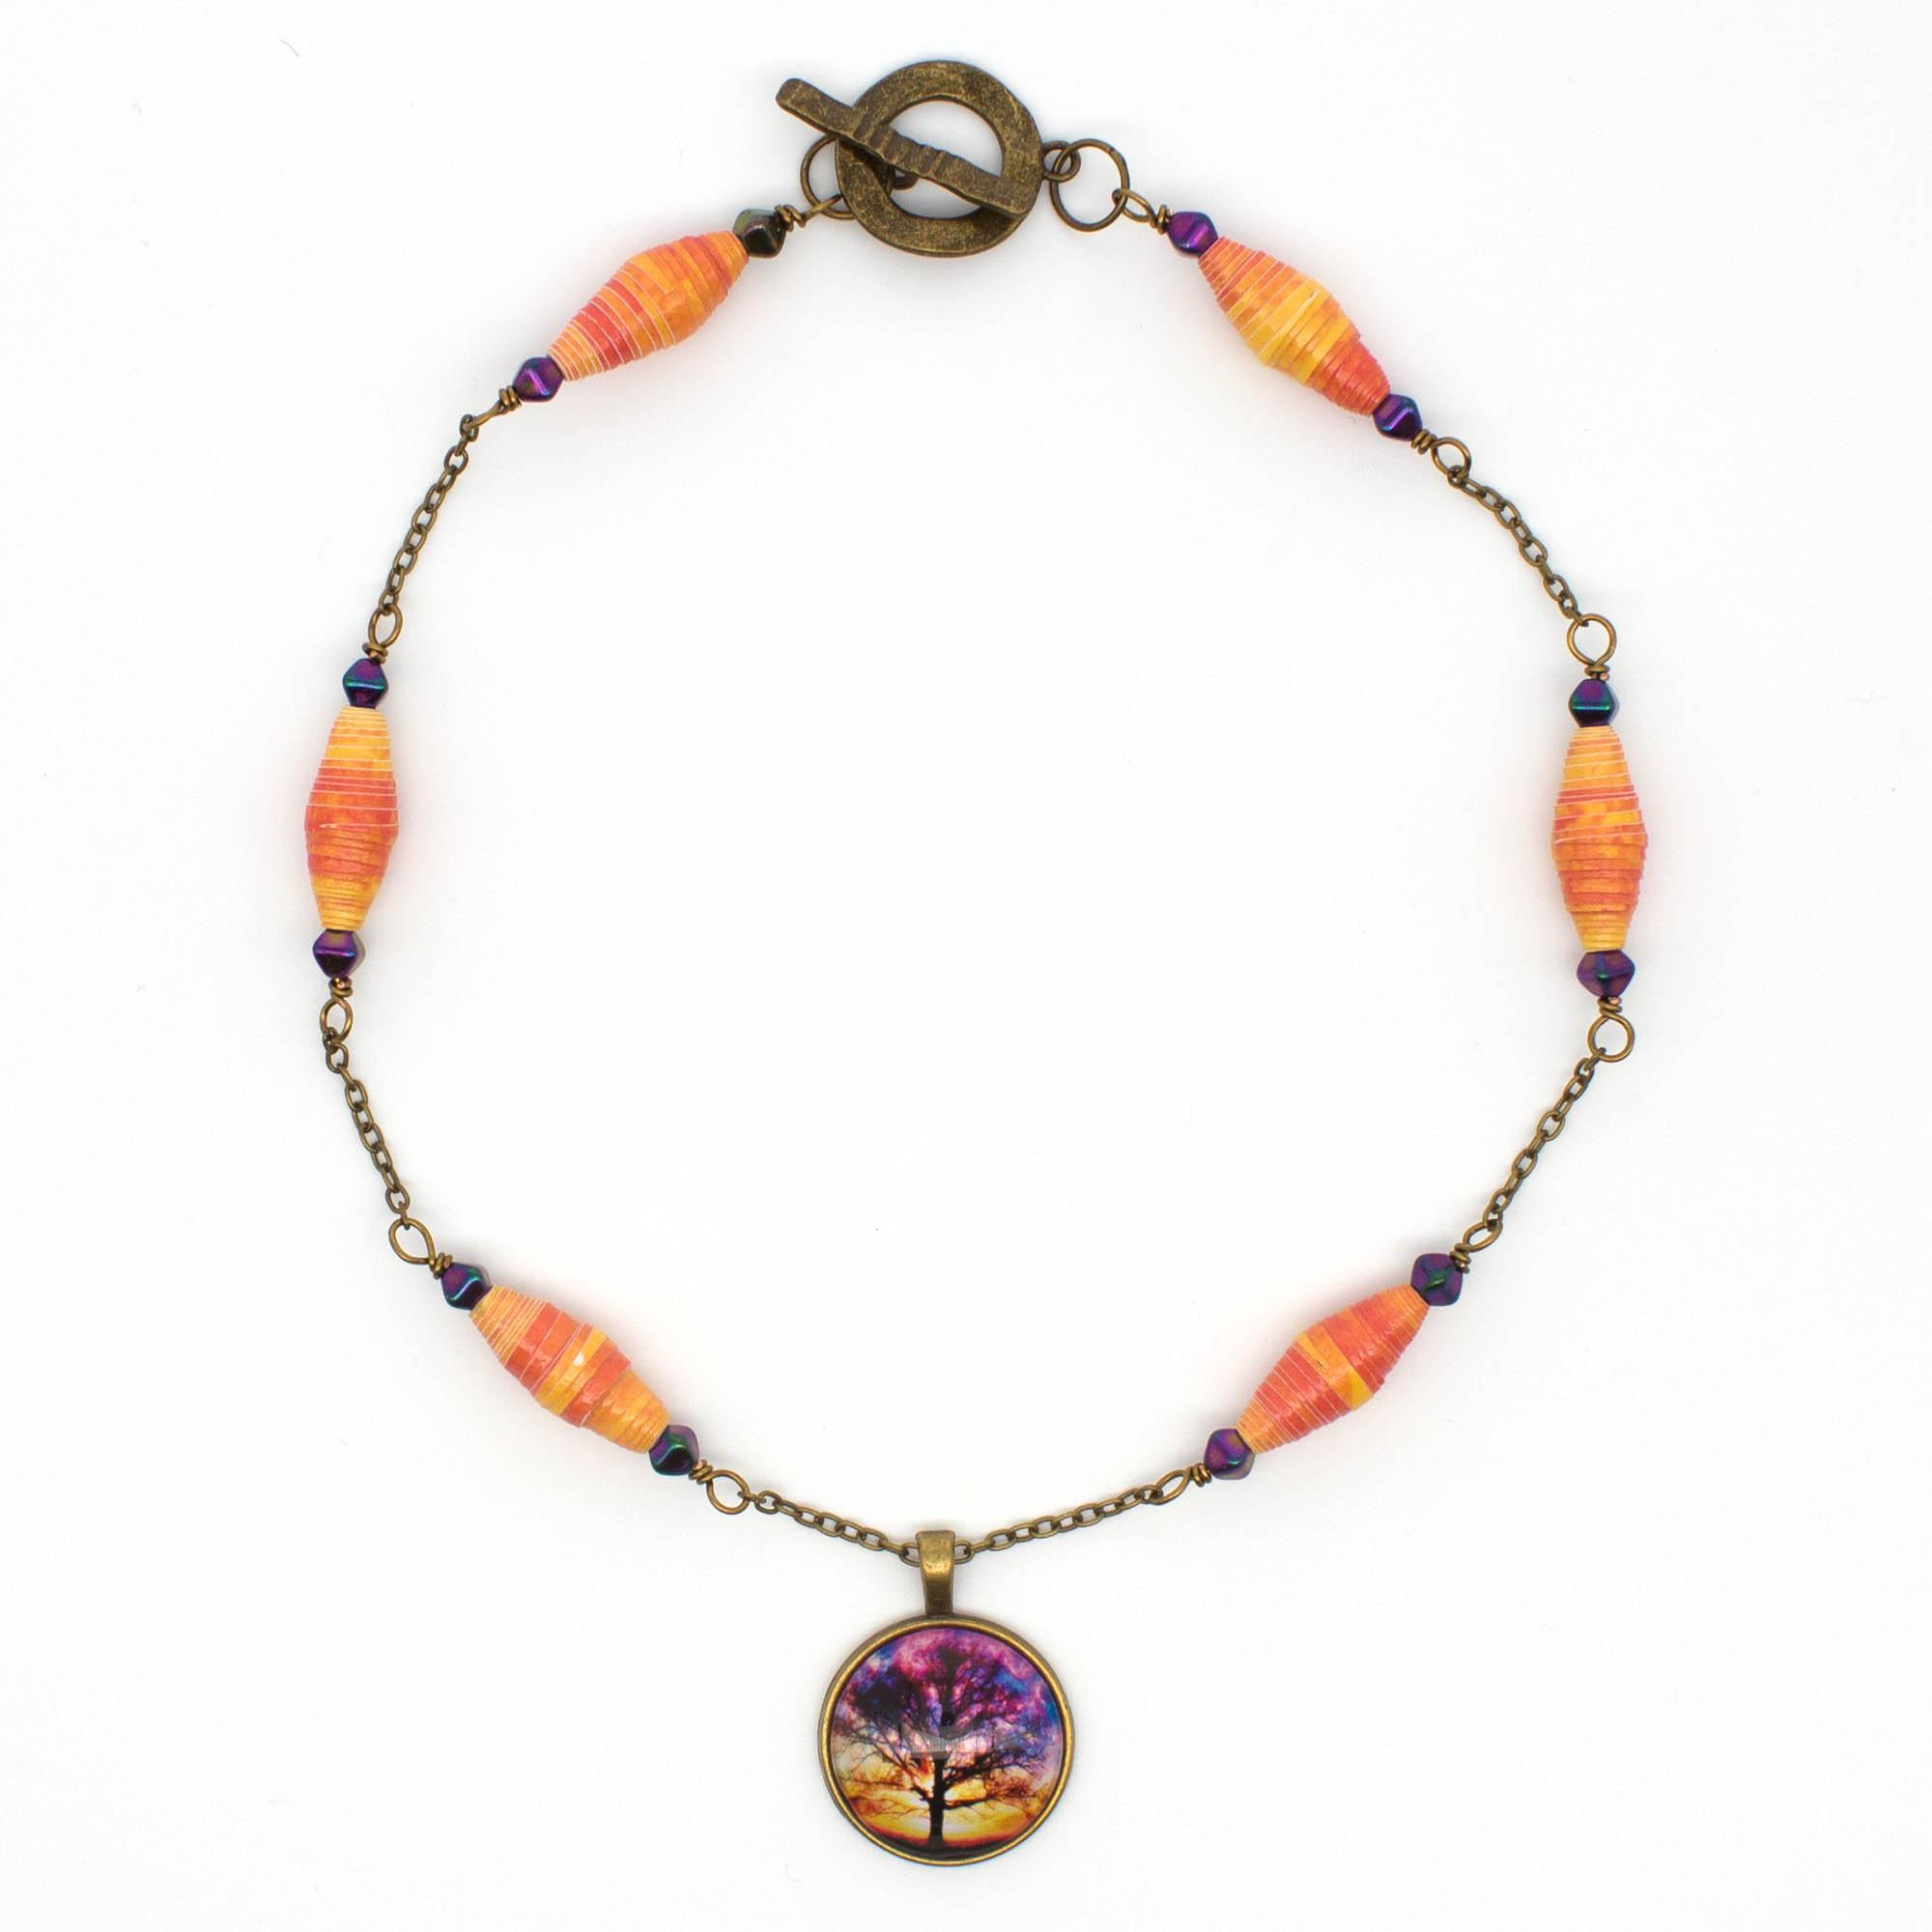 NE814a - Sunset Storm Necklace y